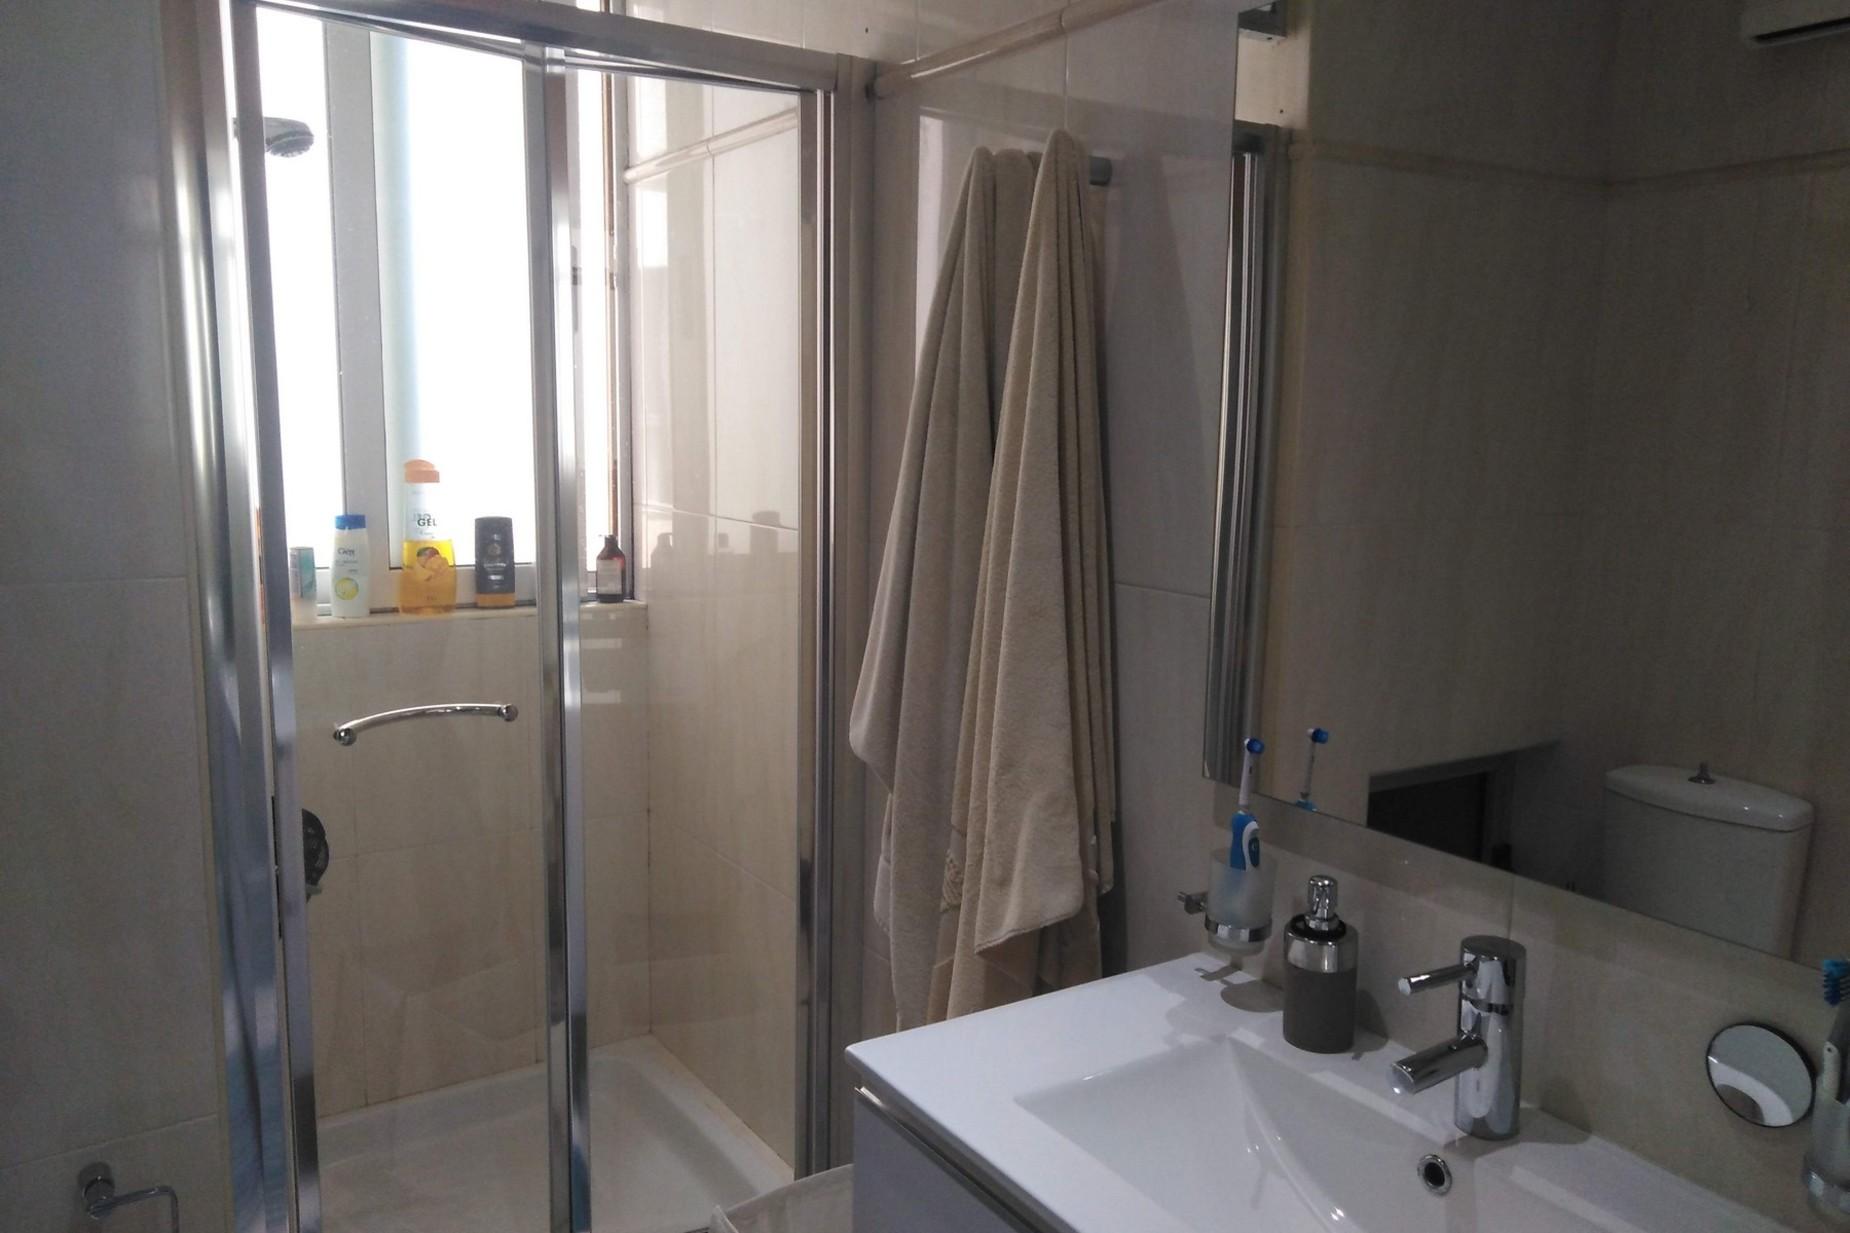 4 bed Apartment For Rent in Sliema, Sliema - thumb 10